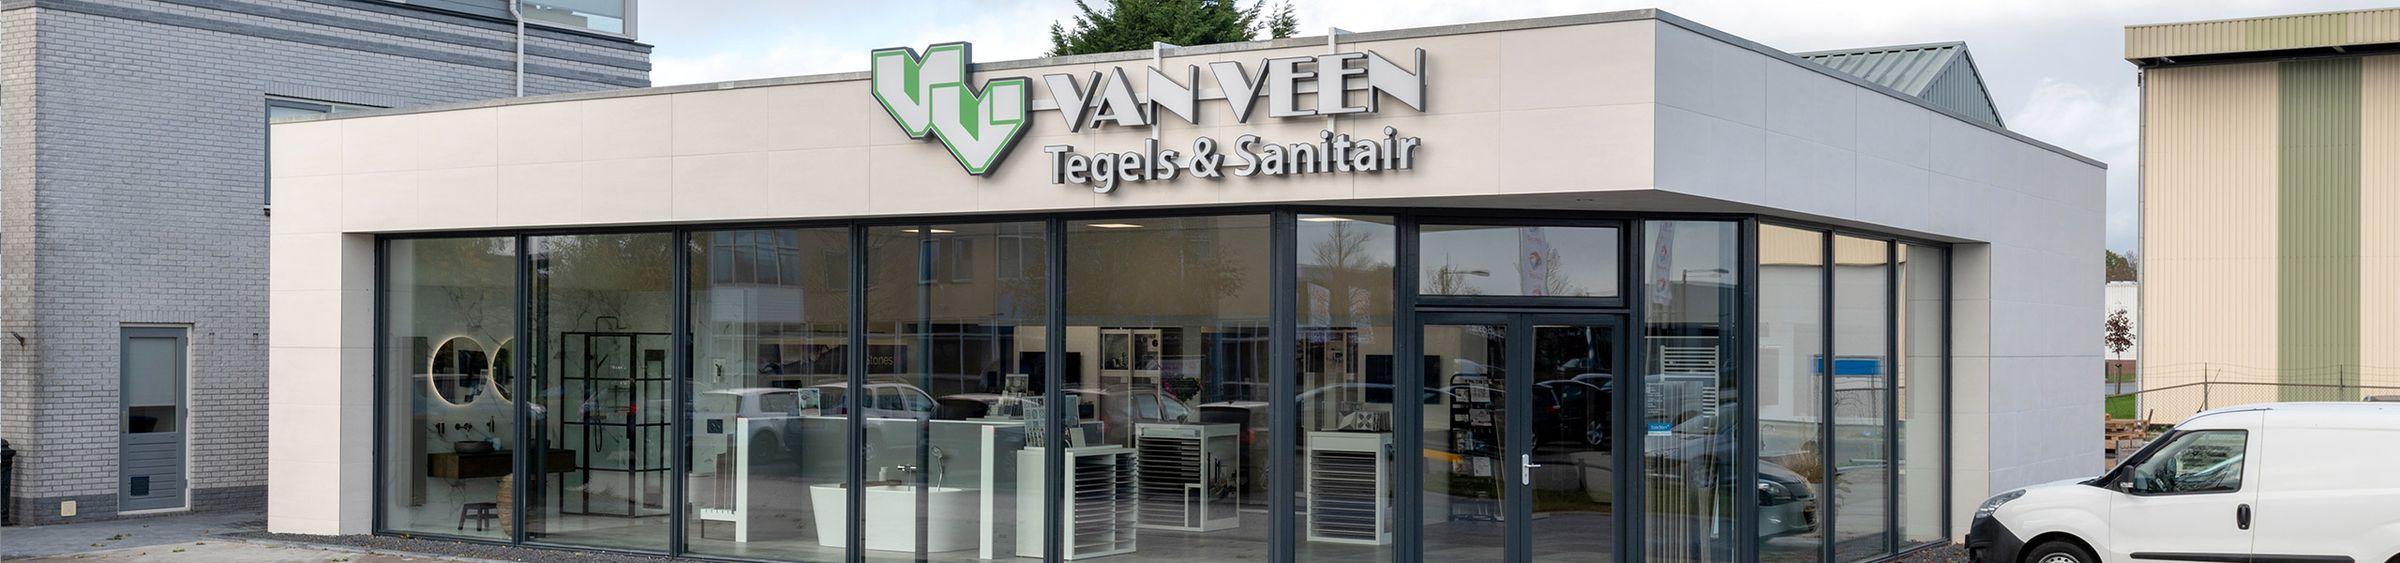 Van Veen Tegels & Sanitair - Van Veen Tegels & Sanitair